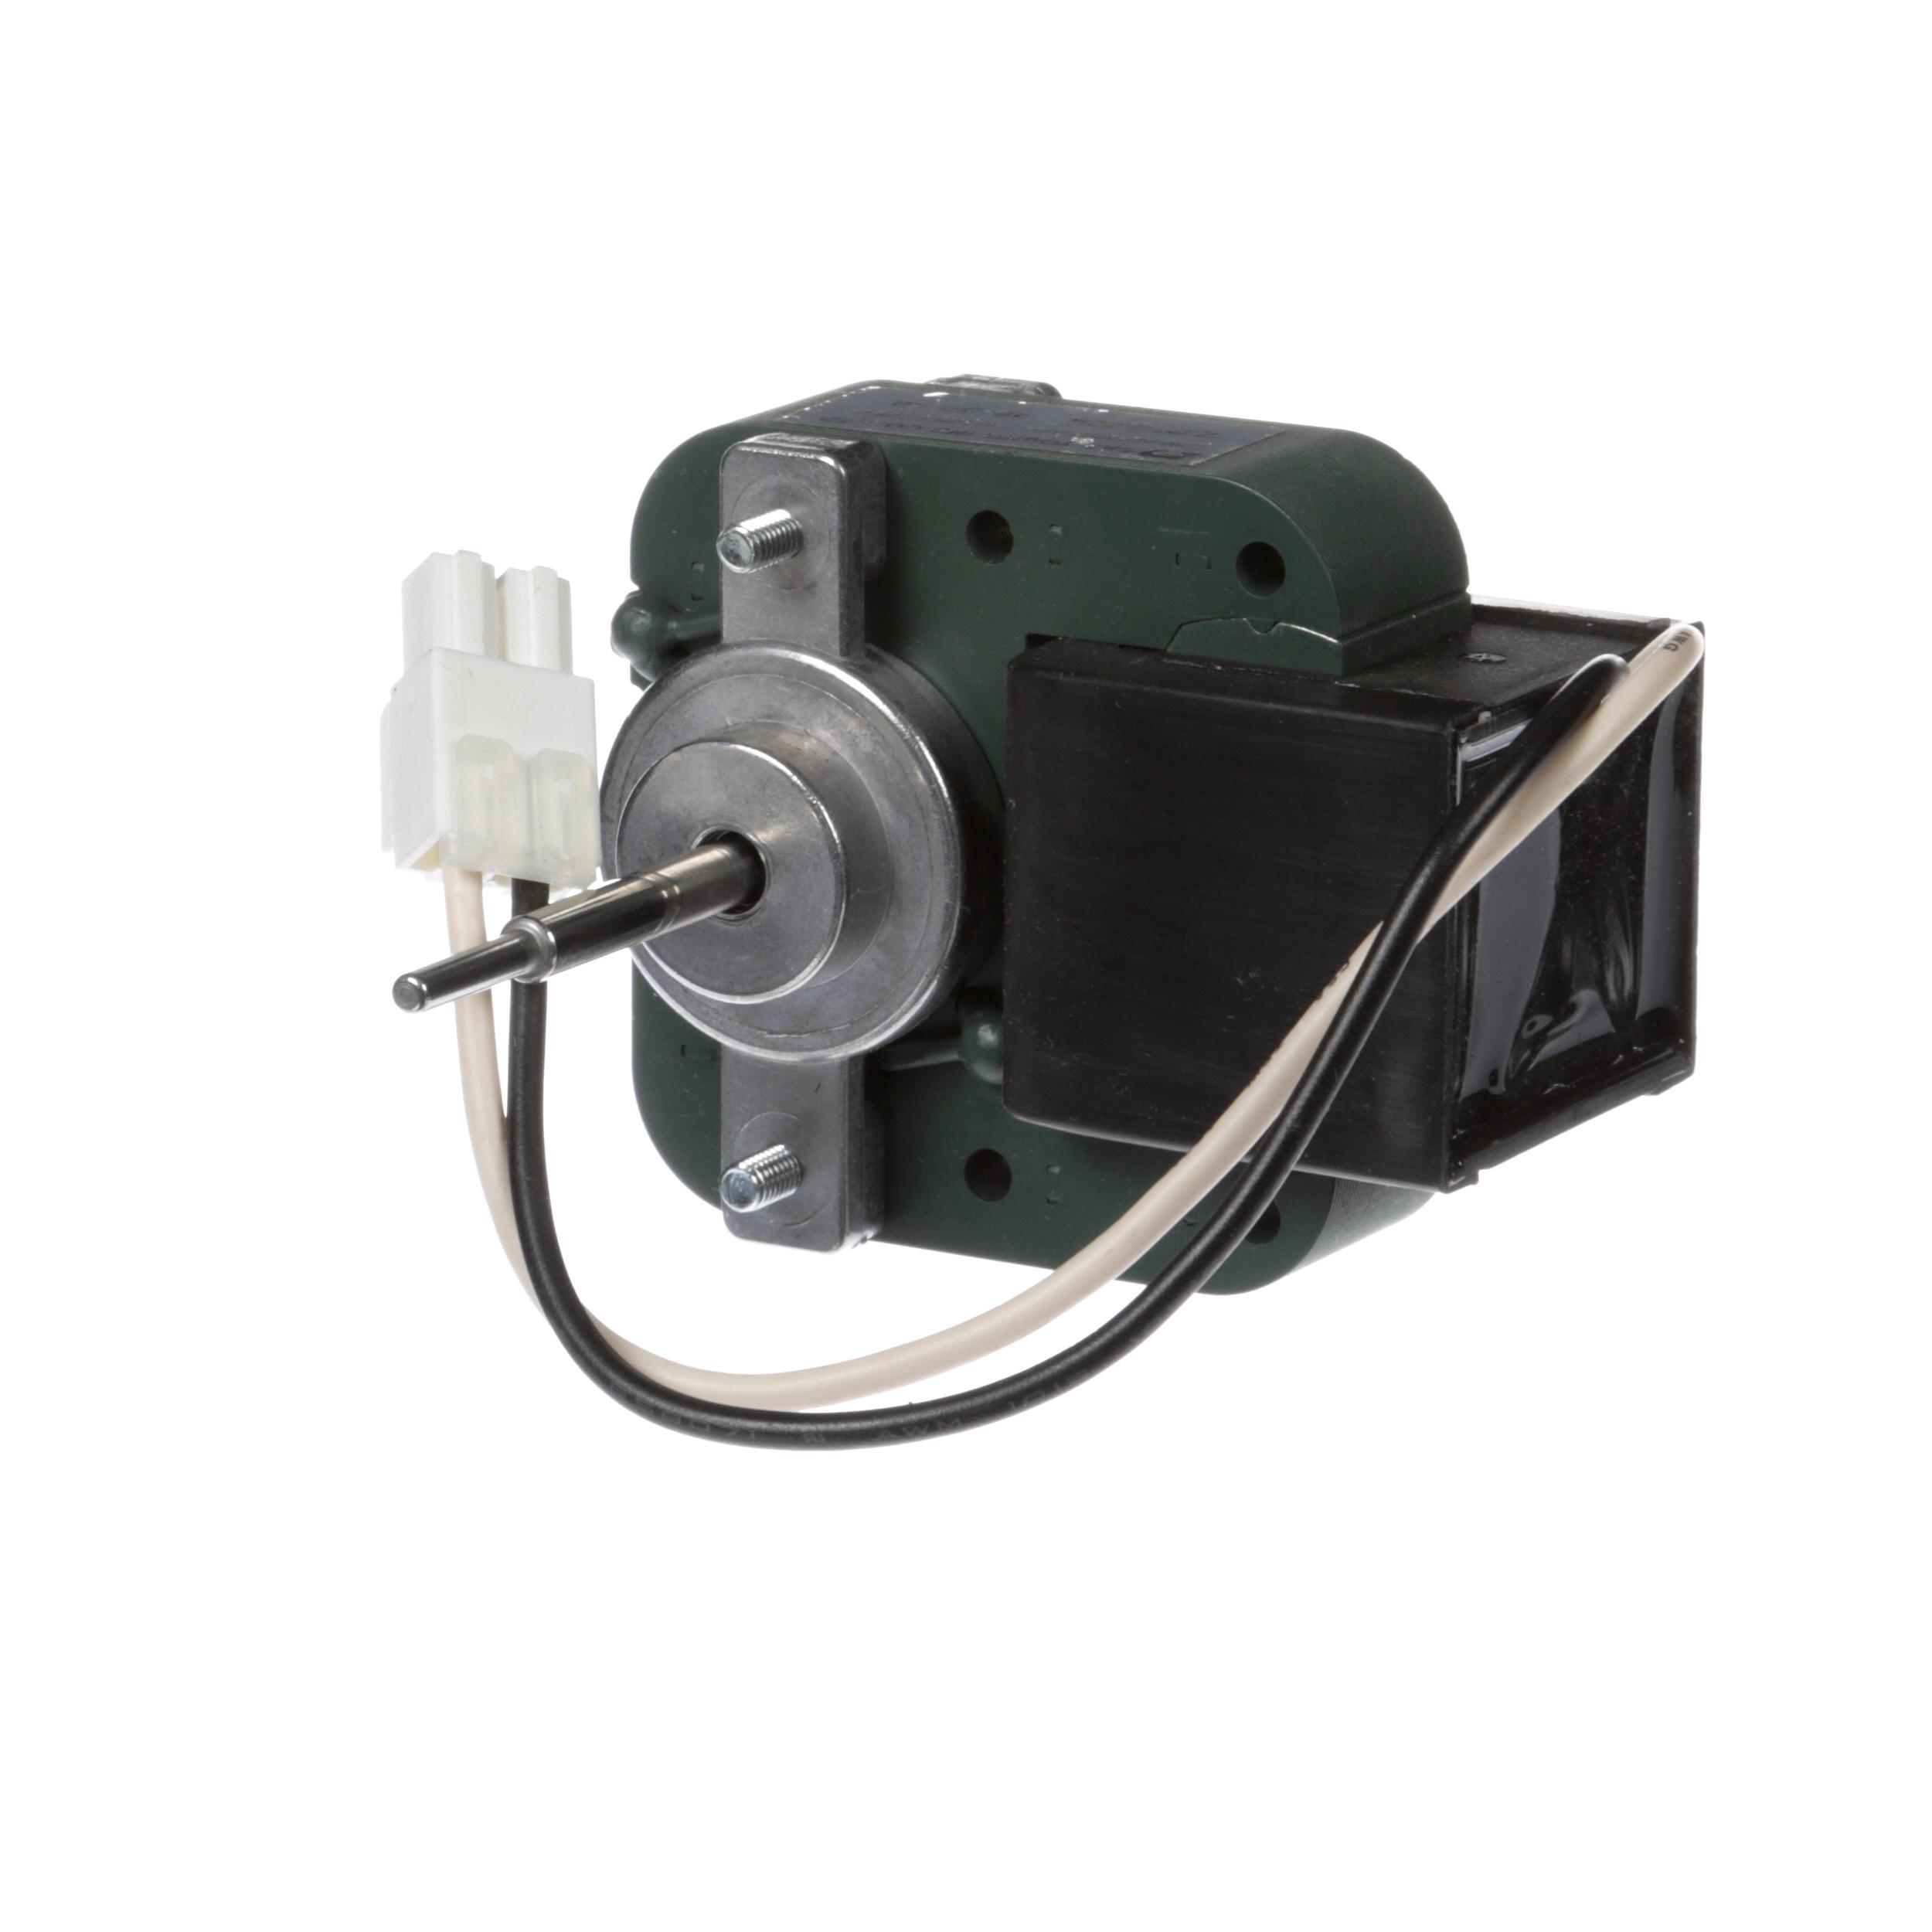 Turbo Air Evap Motor Part 3963339900